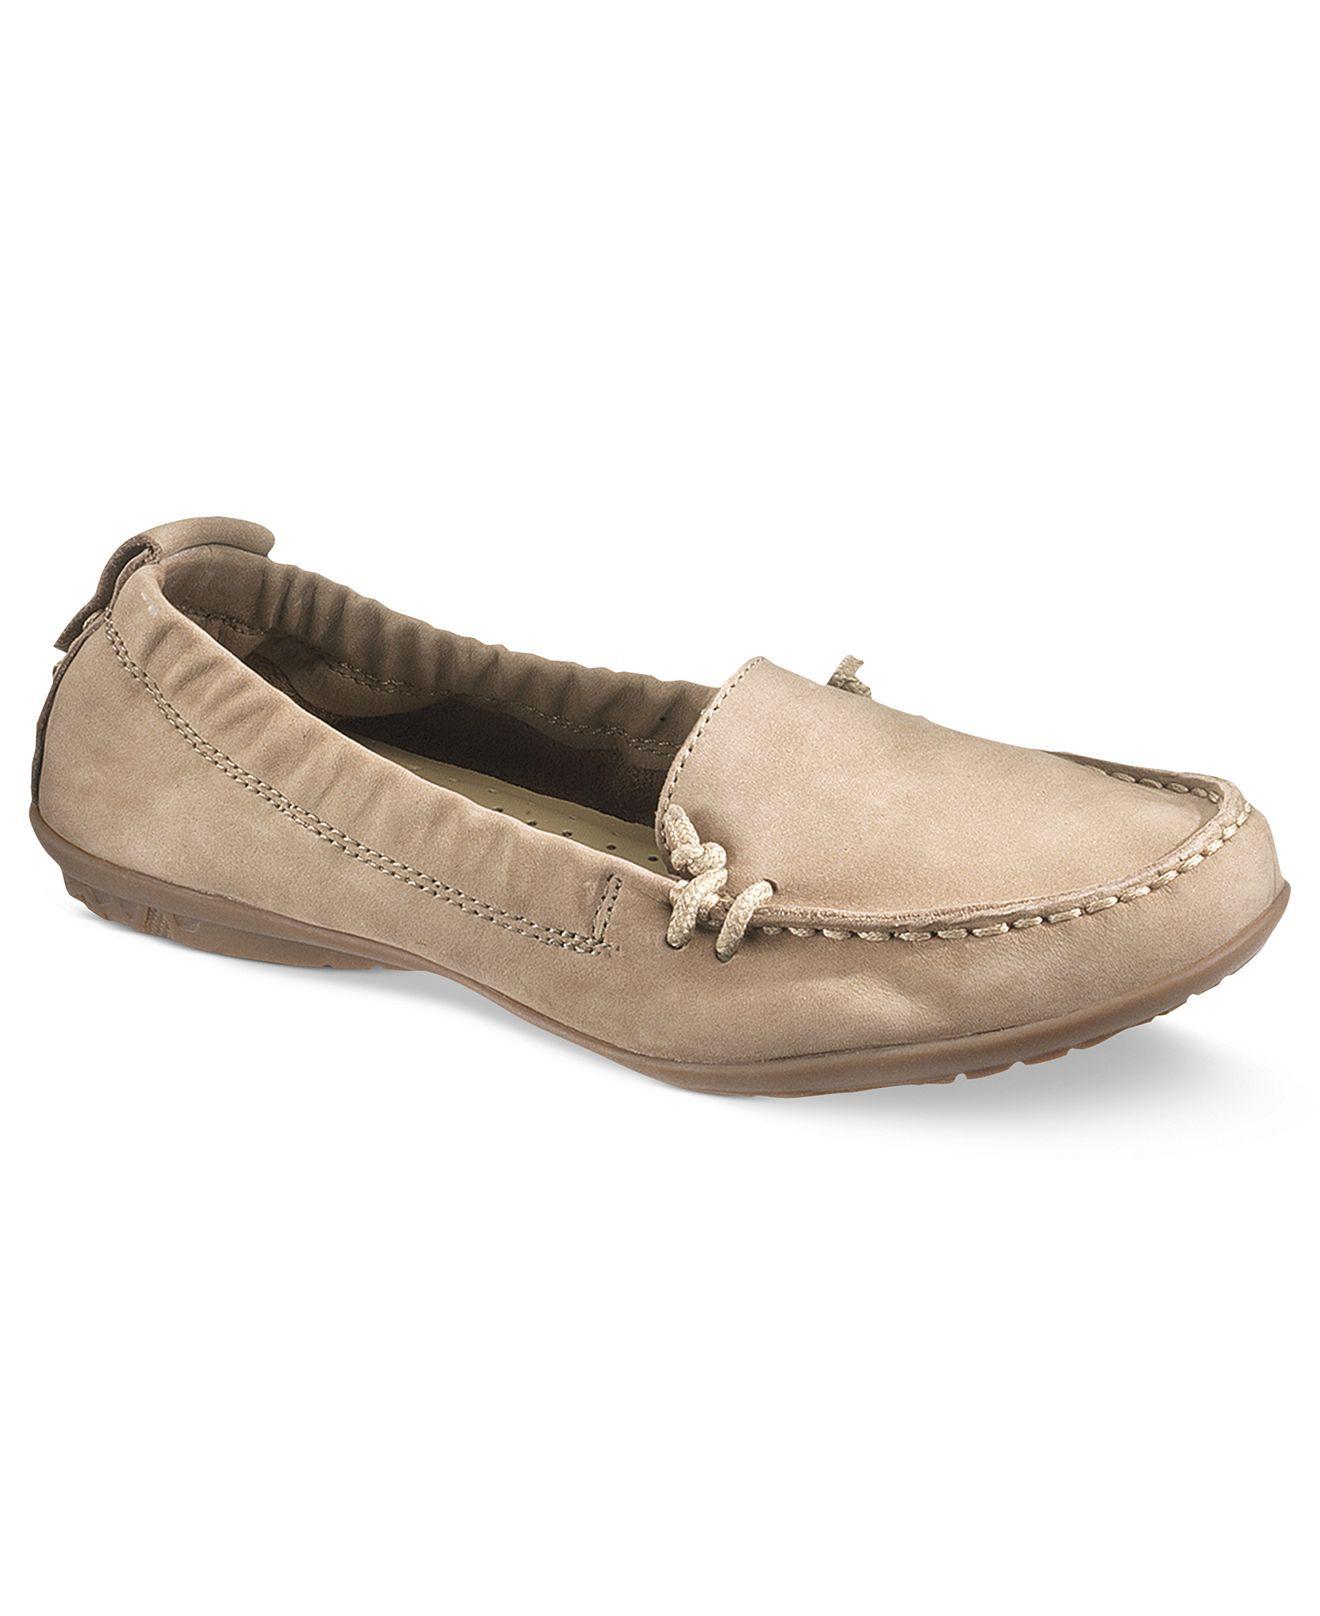 Hush Puppies Women's Shoes, Ceil Moc Flats - Hush Puppies ...